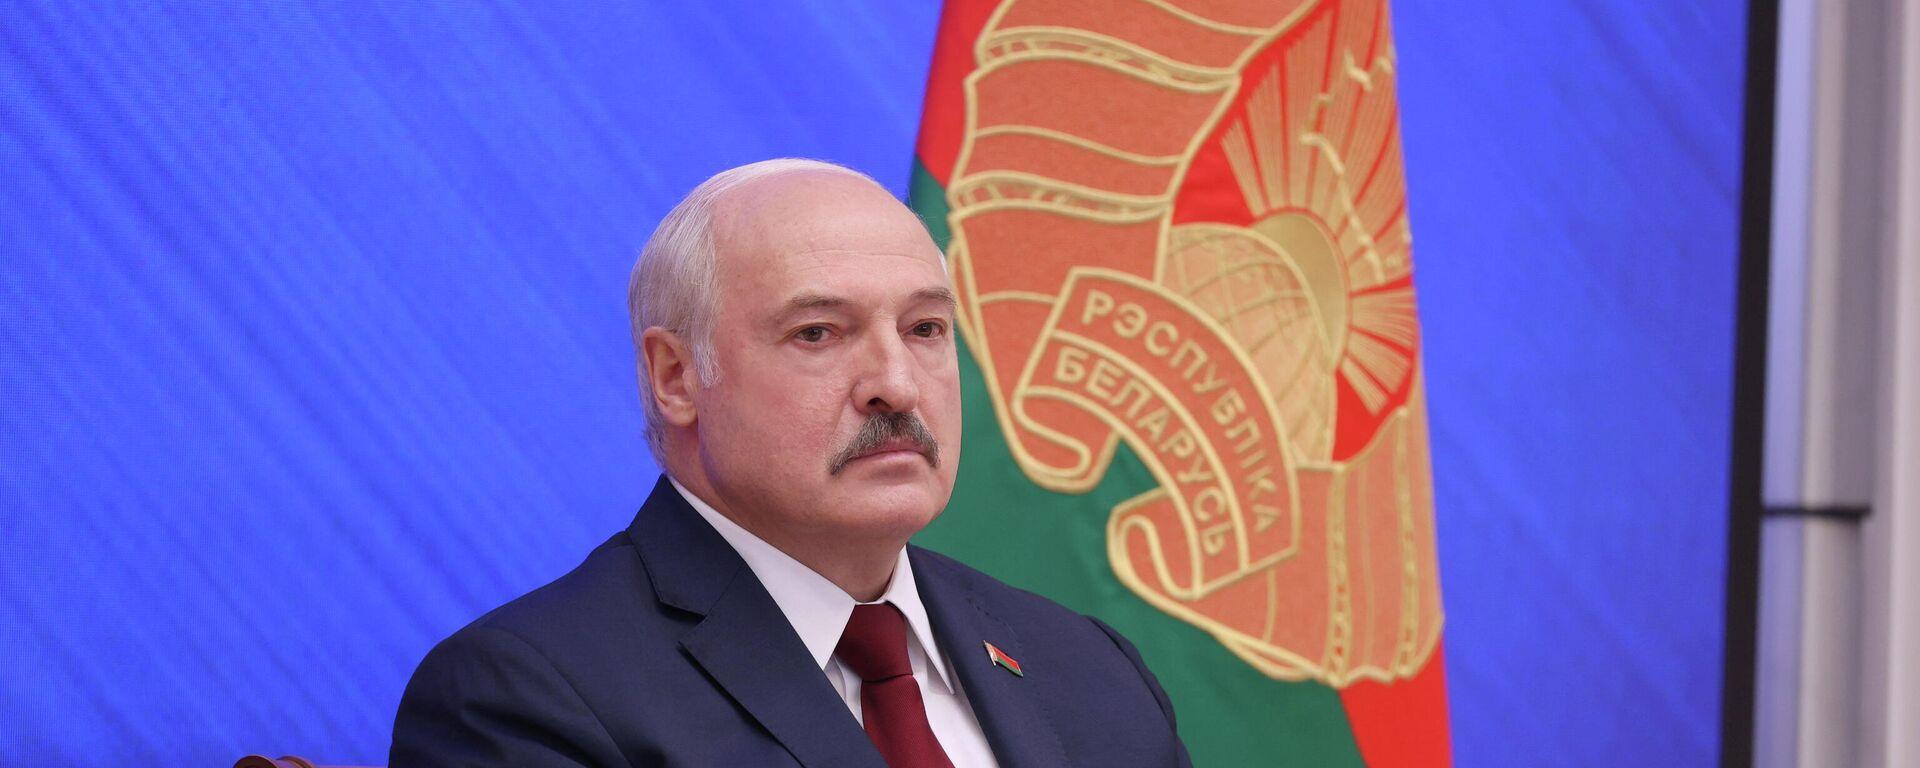 El presidente de Bielorrusia, Alexandr Lukashenko, sostiene rueda de prensa, el 9 de agosto de 2021 - Sputnik Mundo, 1920, 10.08.2021